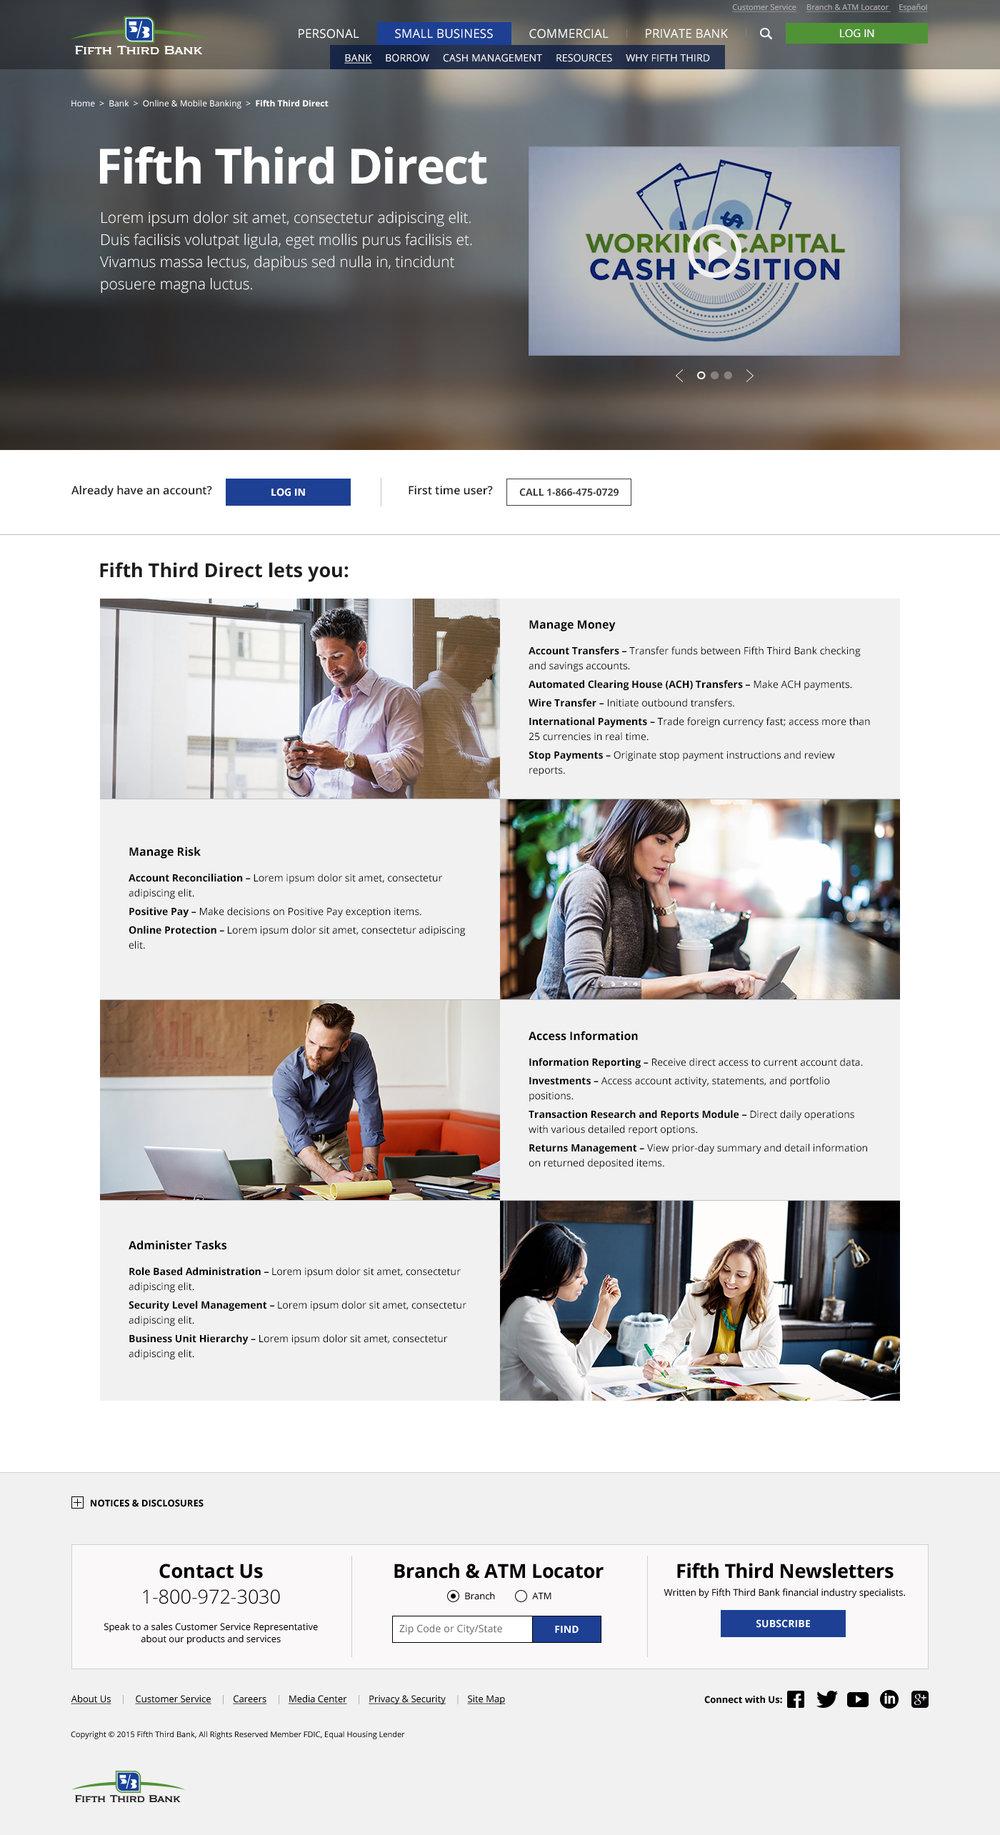 53_Set2_Desktop_3E_Business_Bank_OnlineAndMobile_FifthThirdDirect.jpg